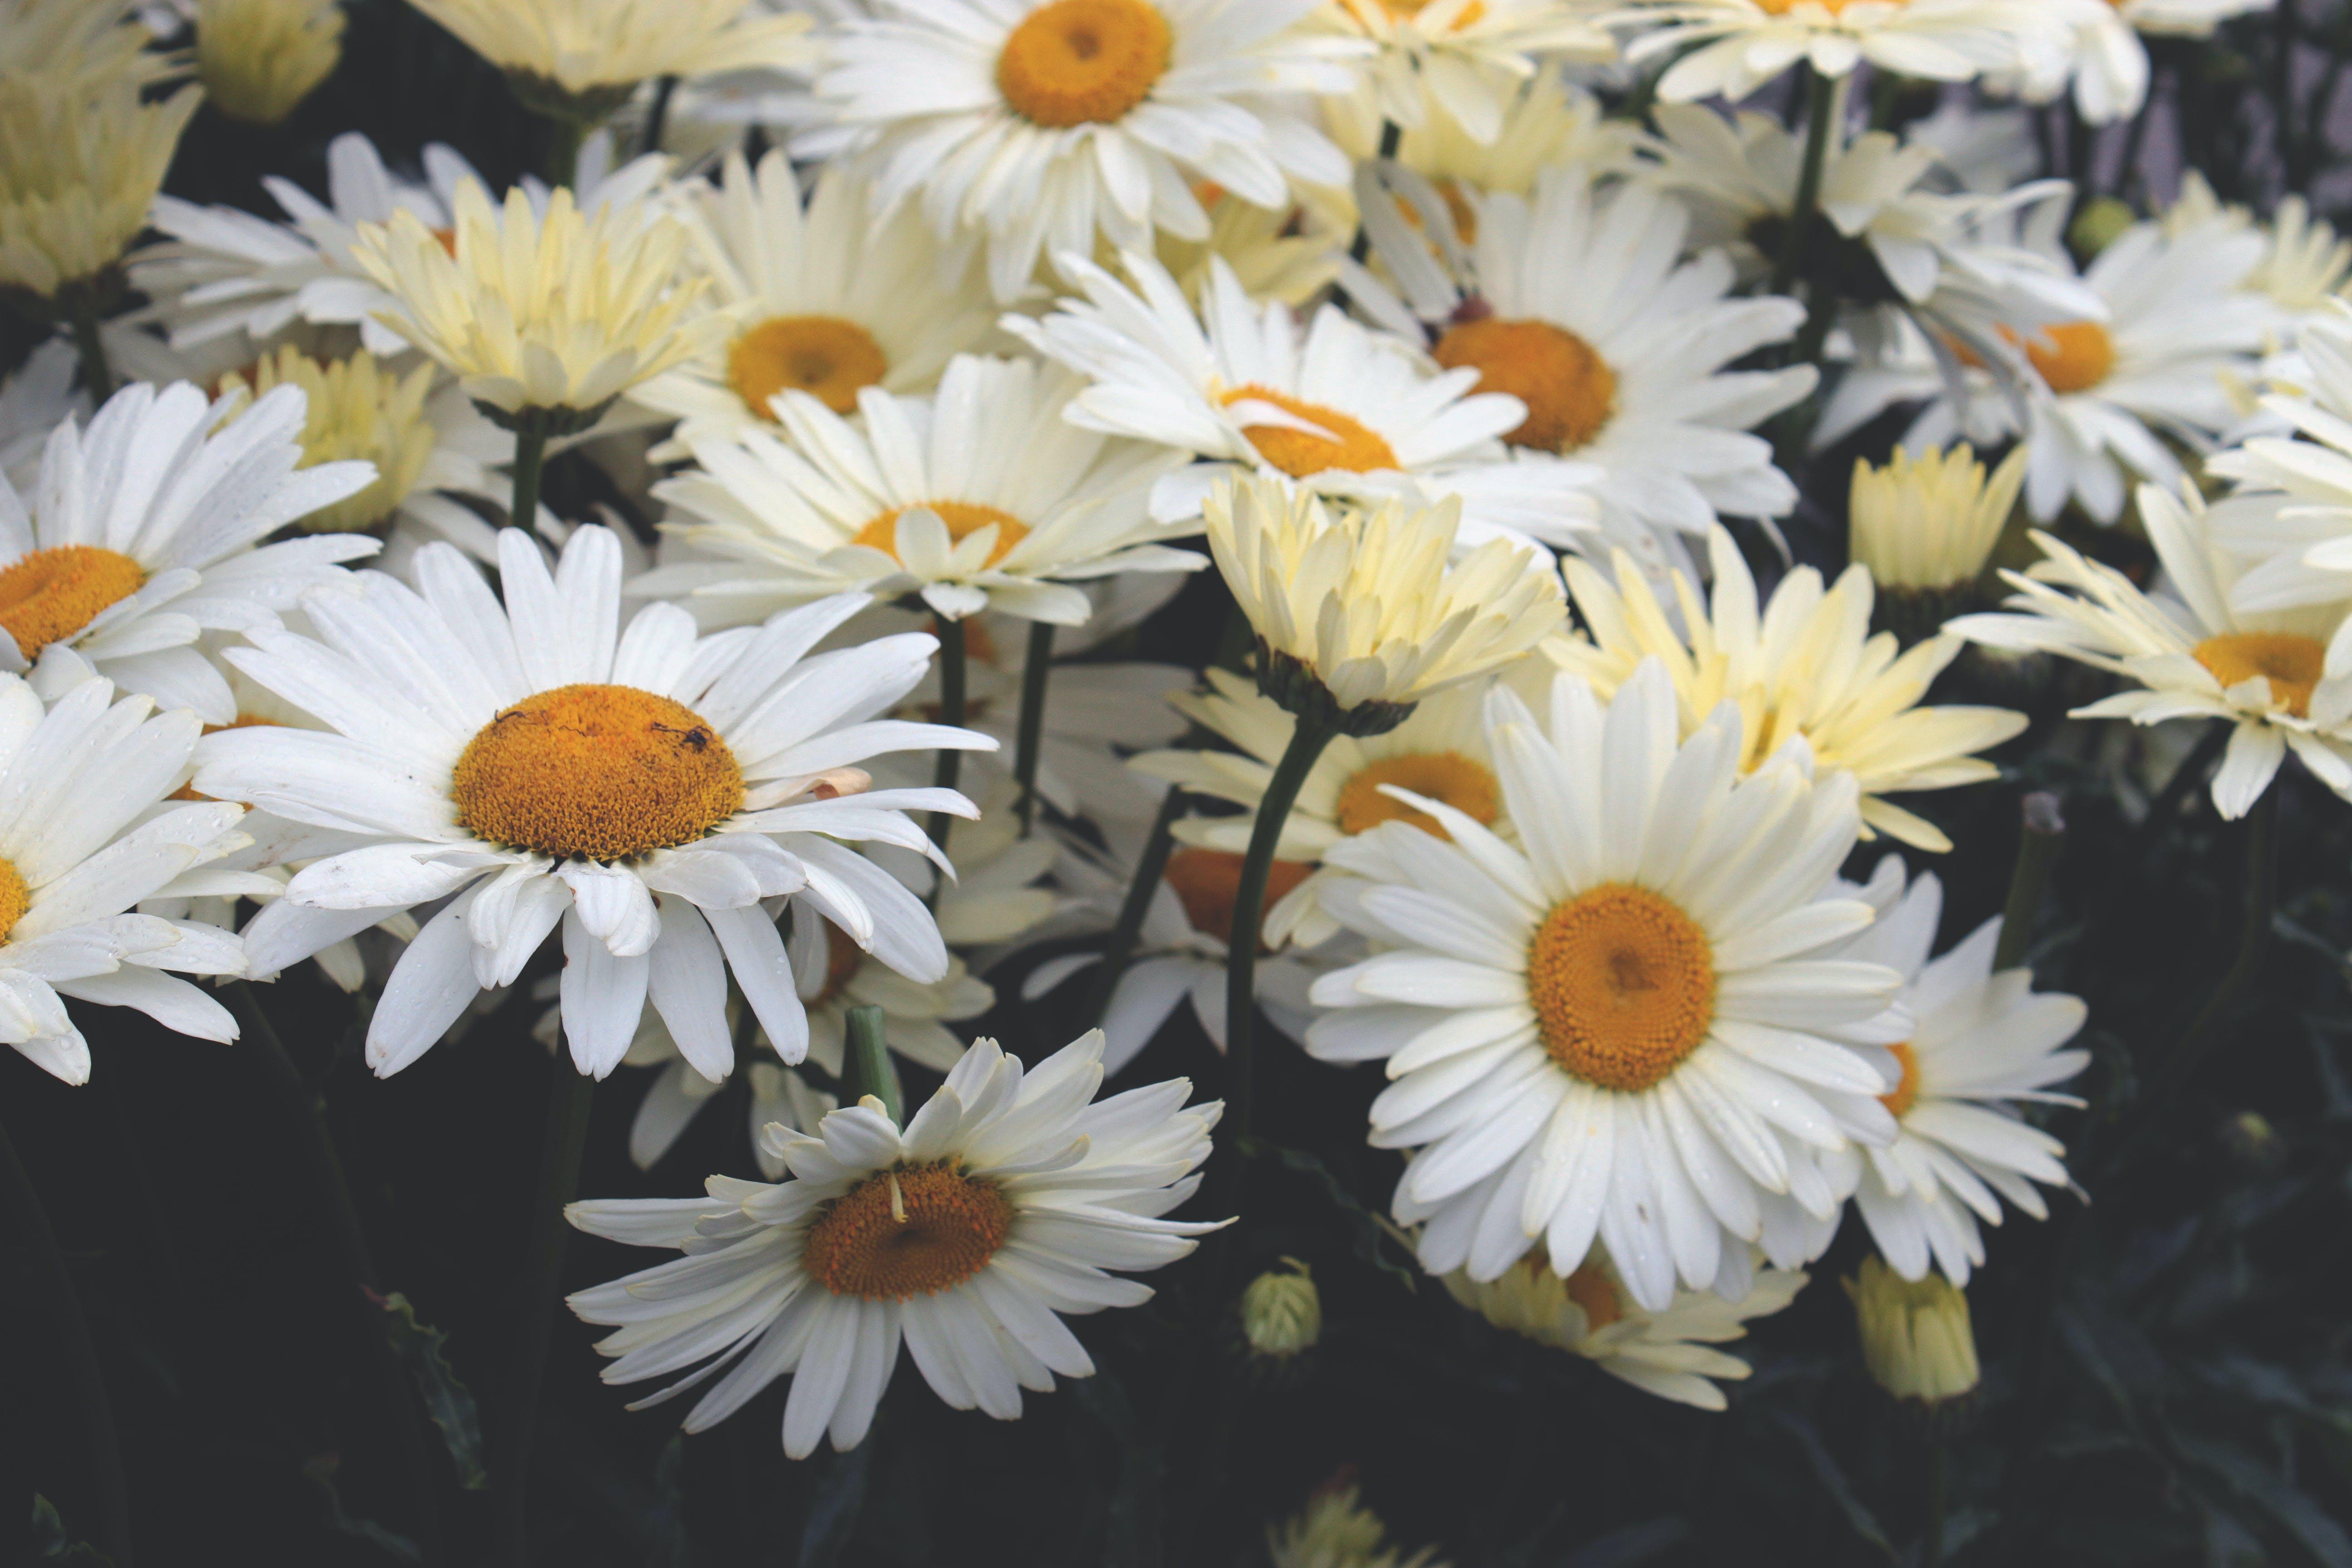 Yellow Daisies Closeup Photography at Daytime